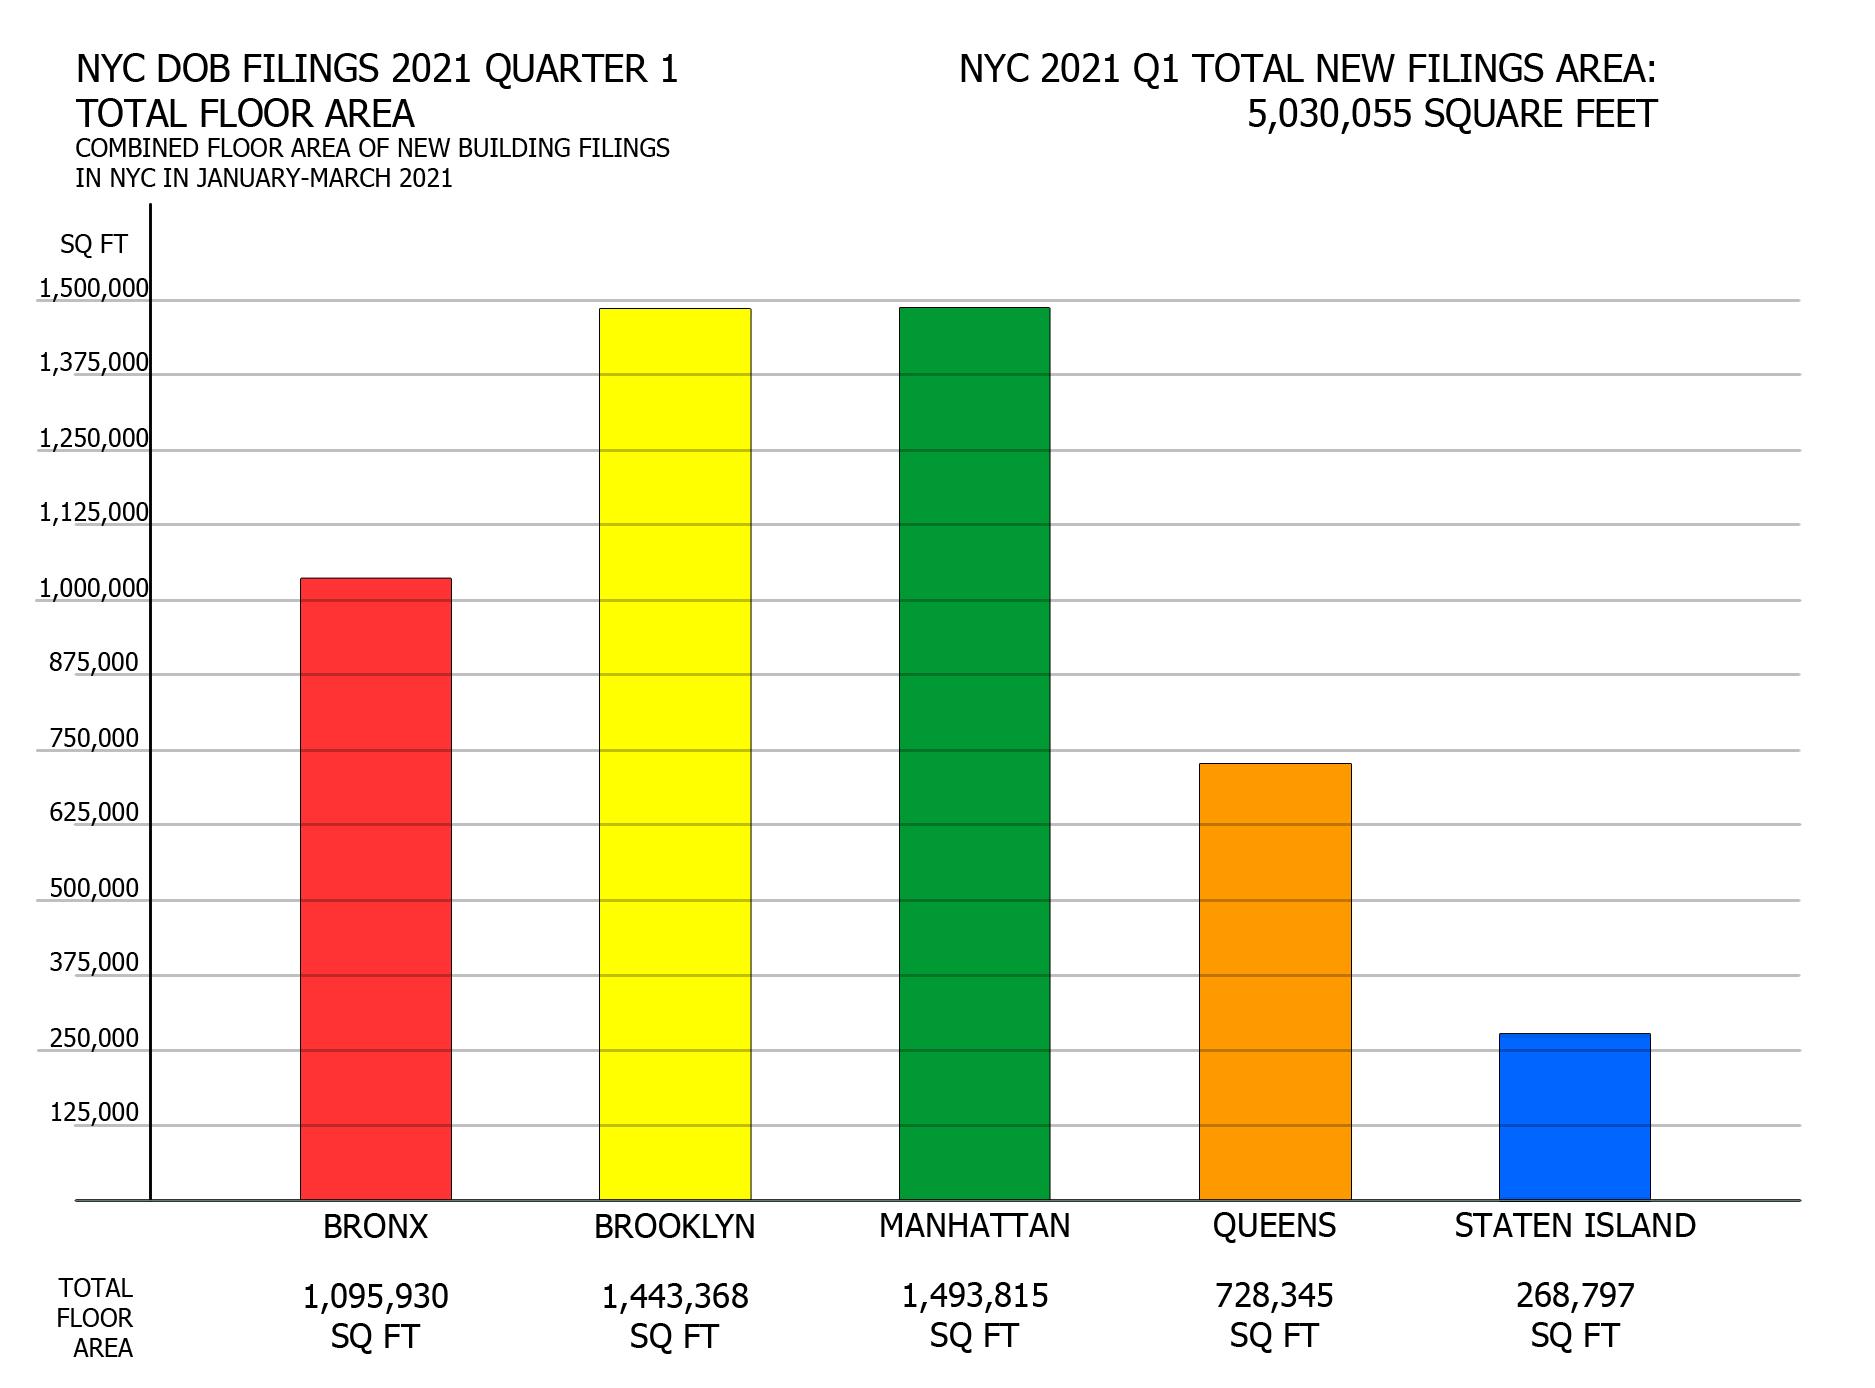 NYC DOB filings in first quarter of 2021 by total proposed floor area per borough. Credit: Vitali Ogorodnikov